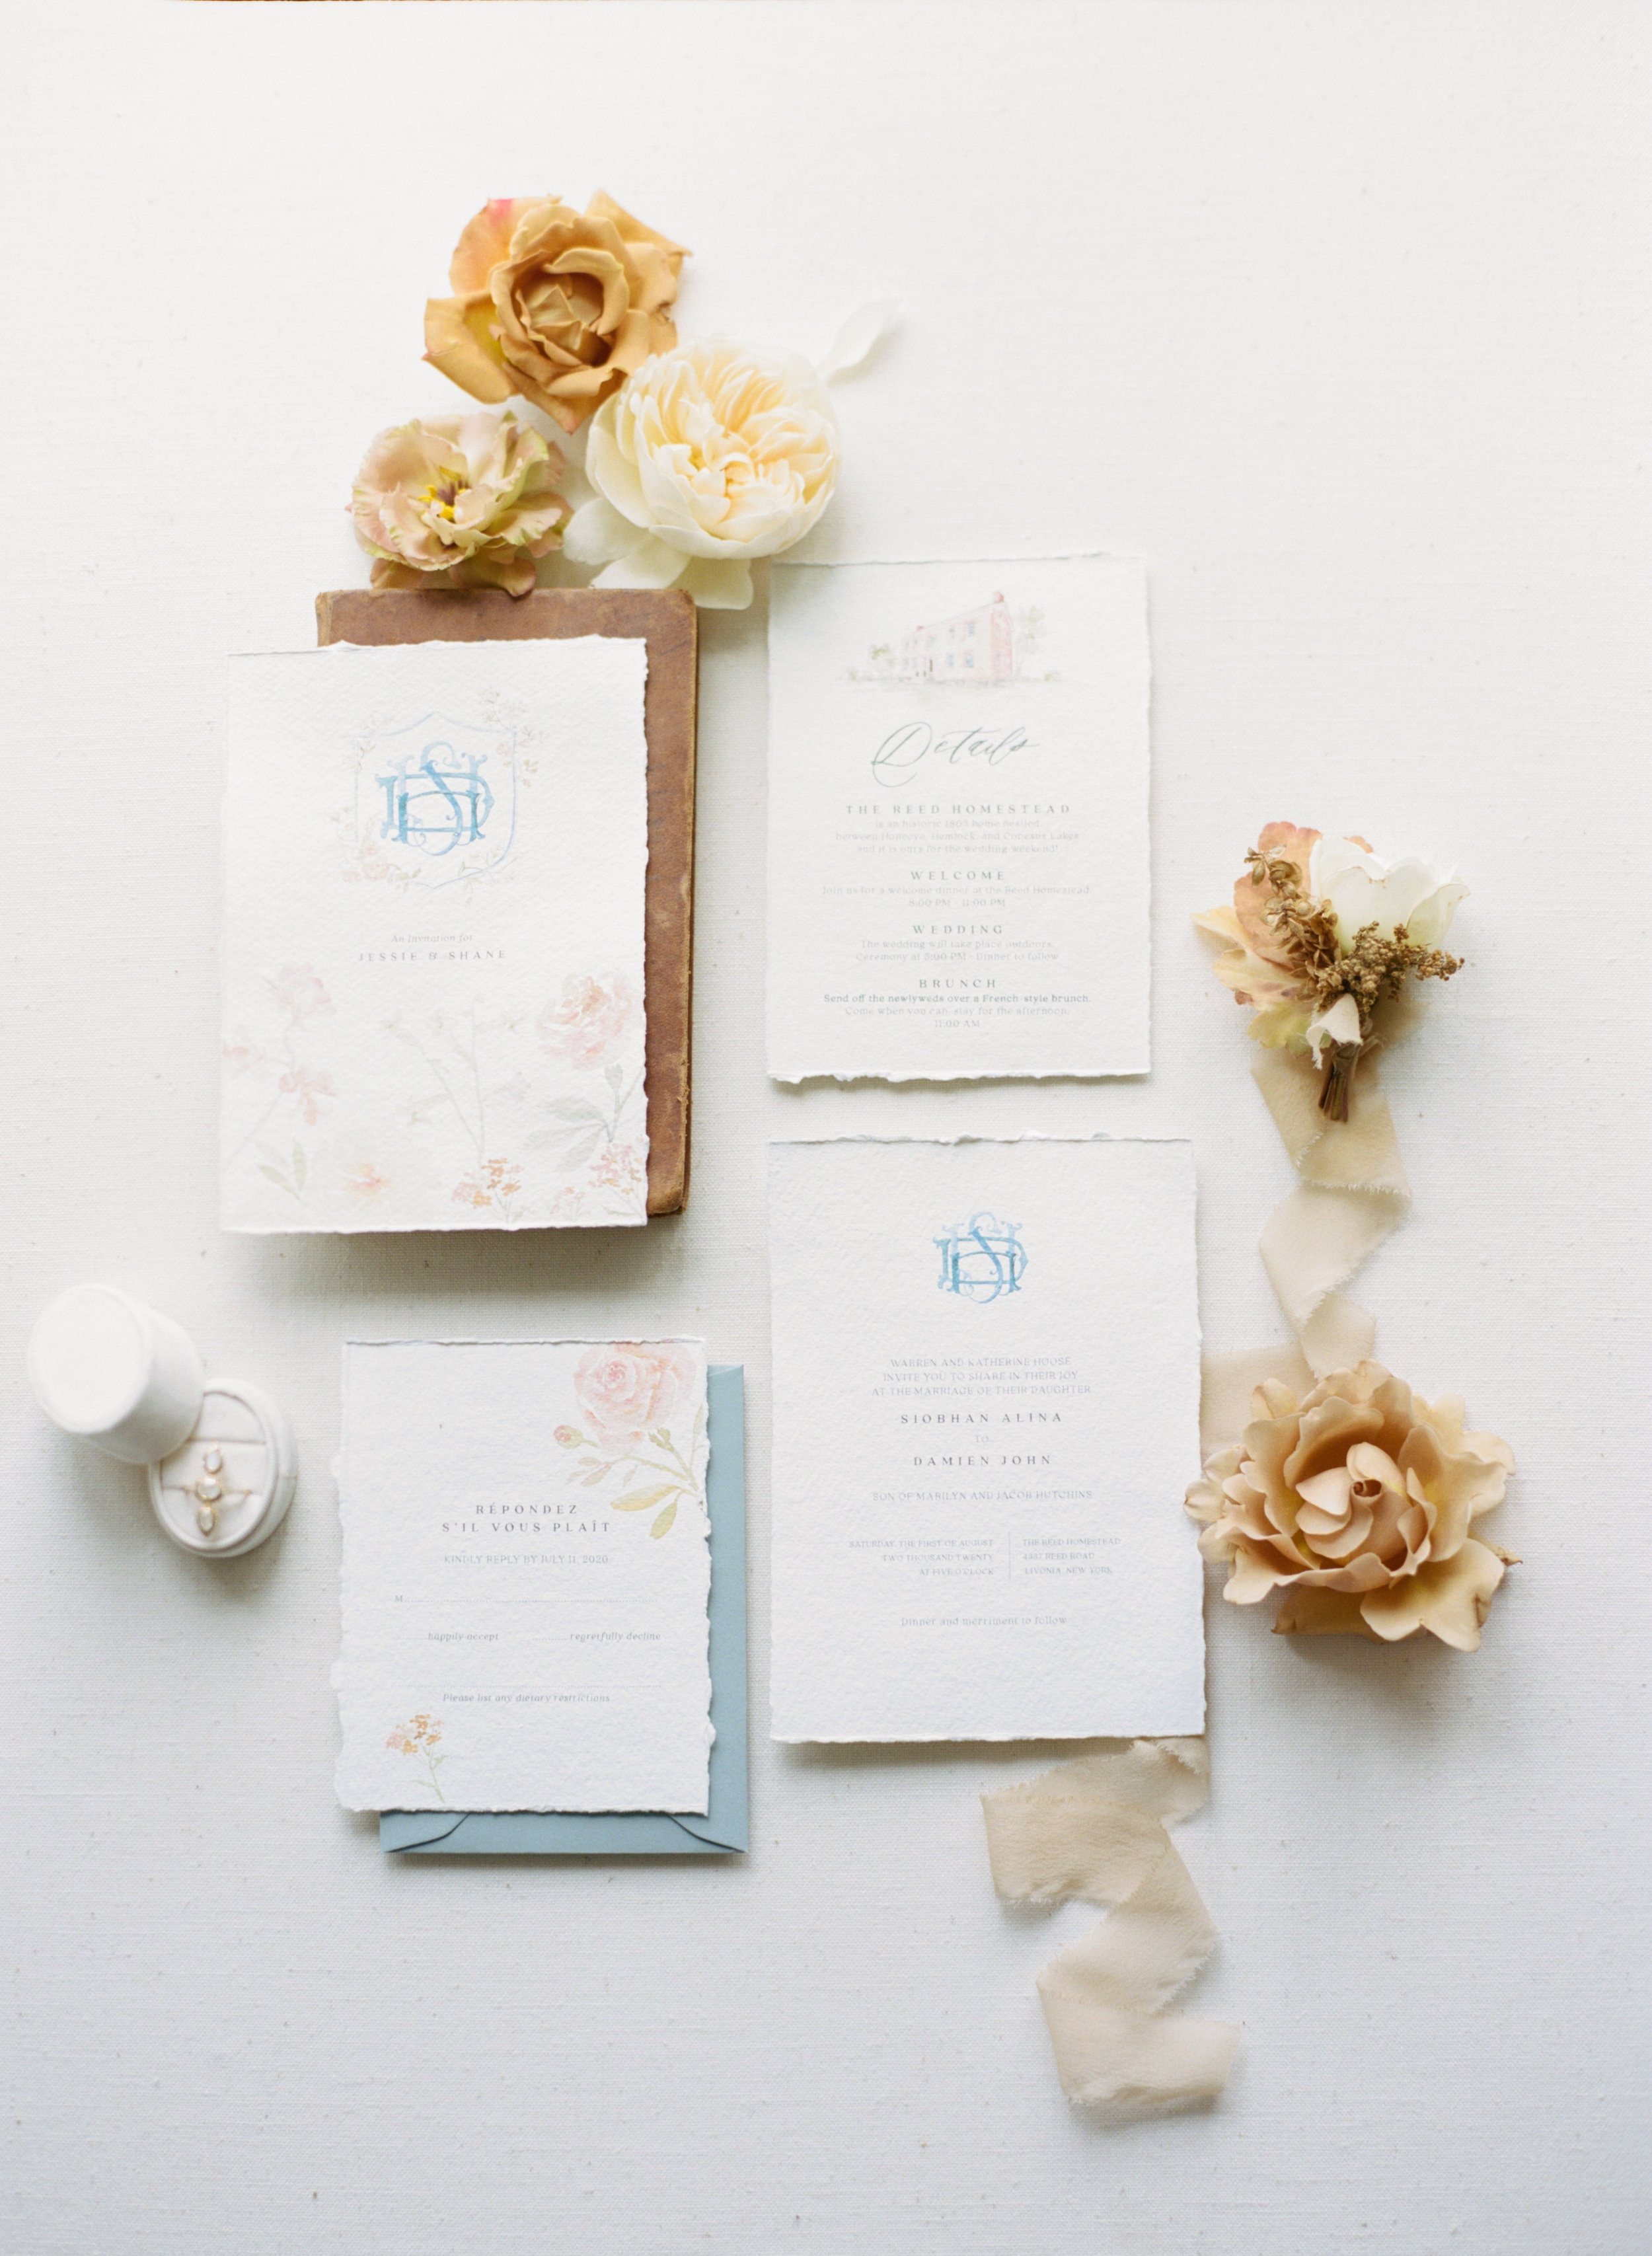 alexandra-meseke-understated-soft-luxury-wedding-upstate-ny_0003.jpg